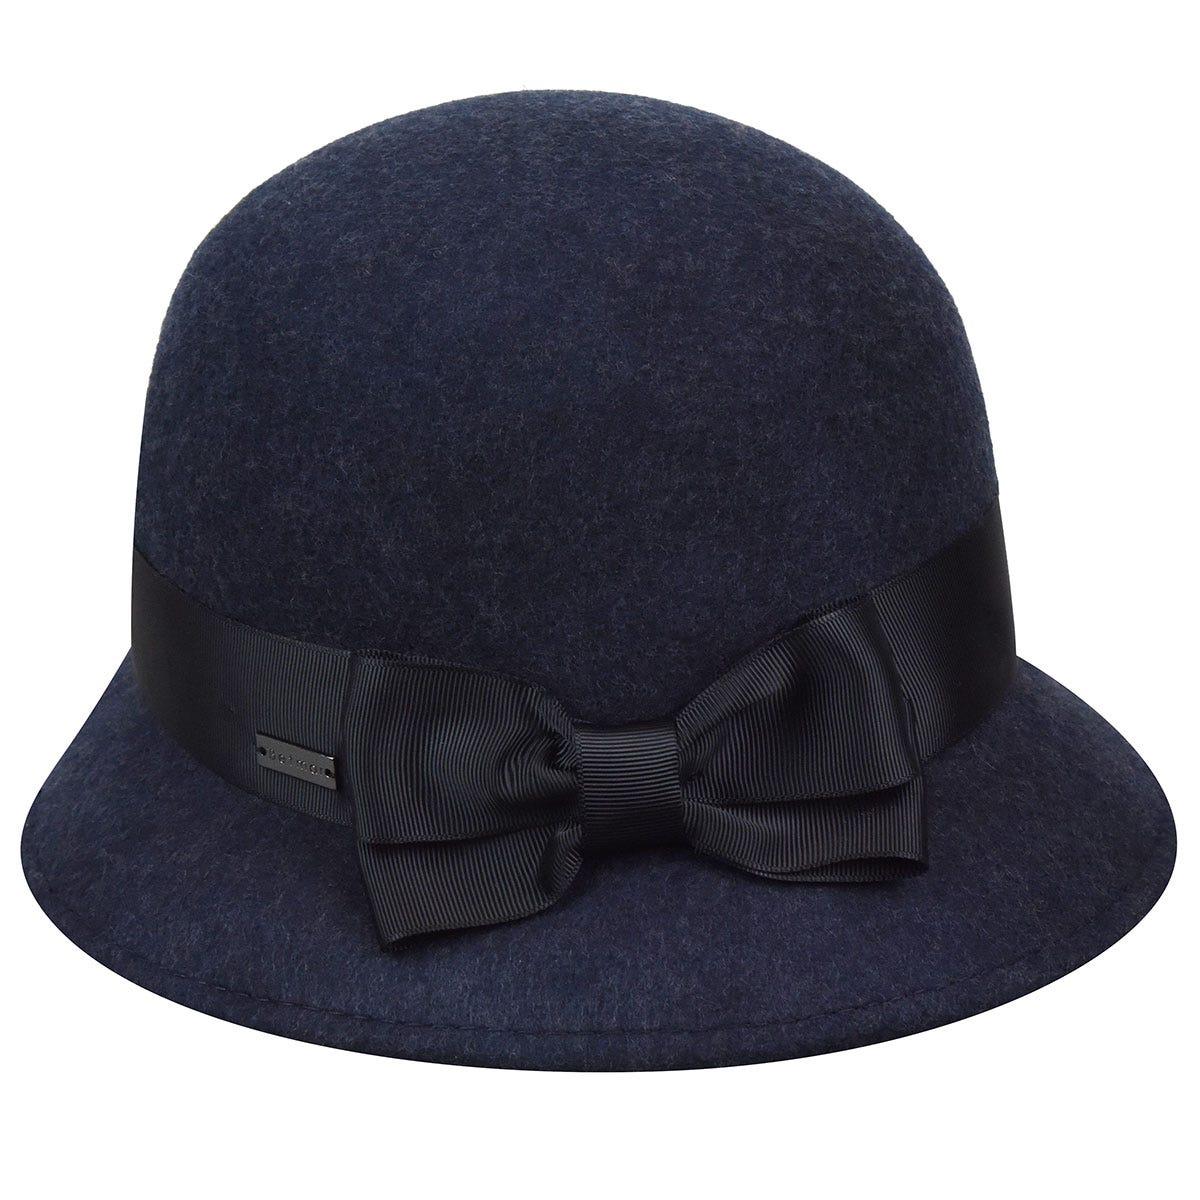 1920s Style Hats Emma Wool Felt Cloche $54.00 AT vintagedancer.com